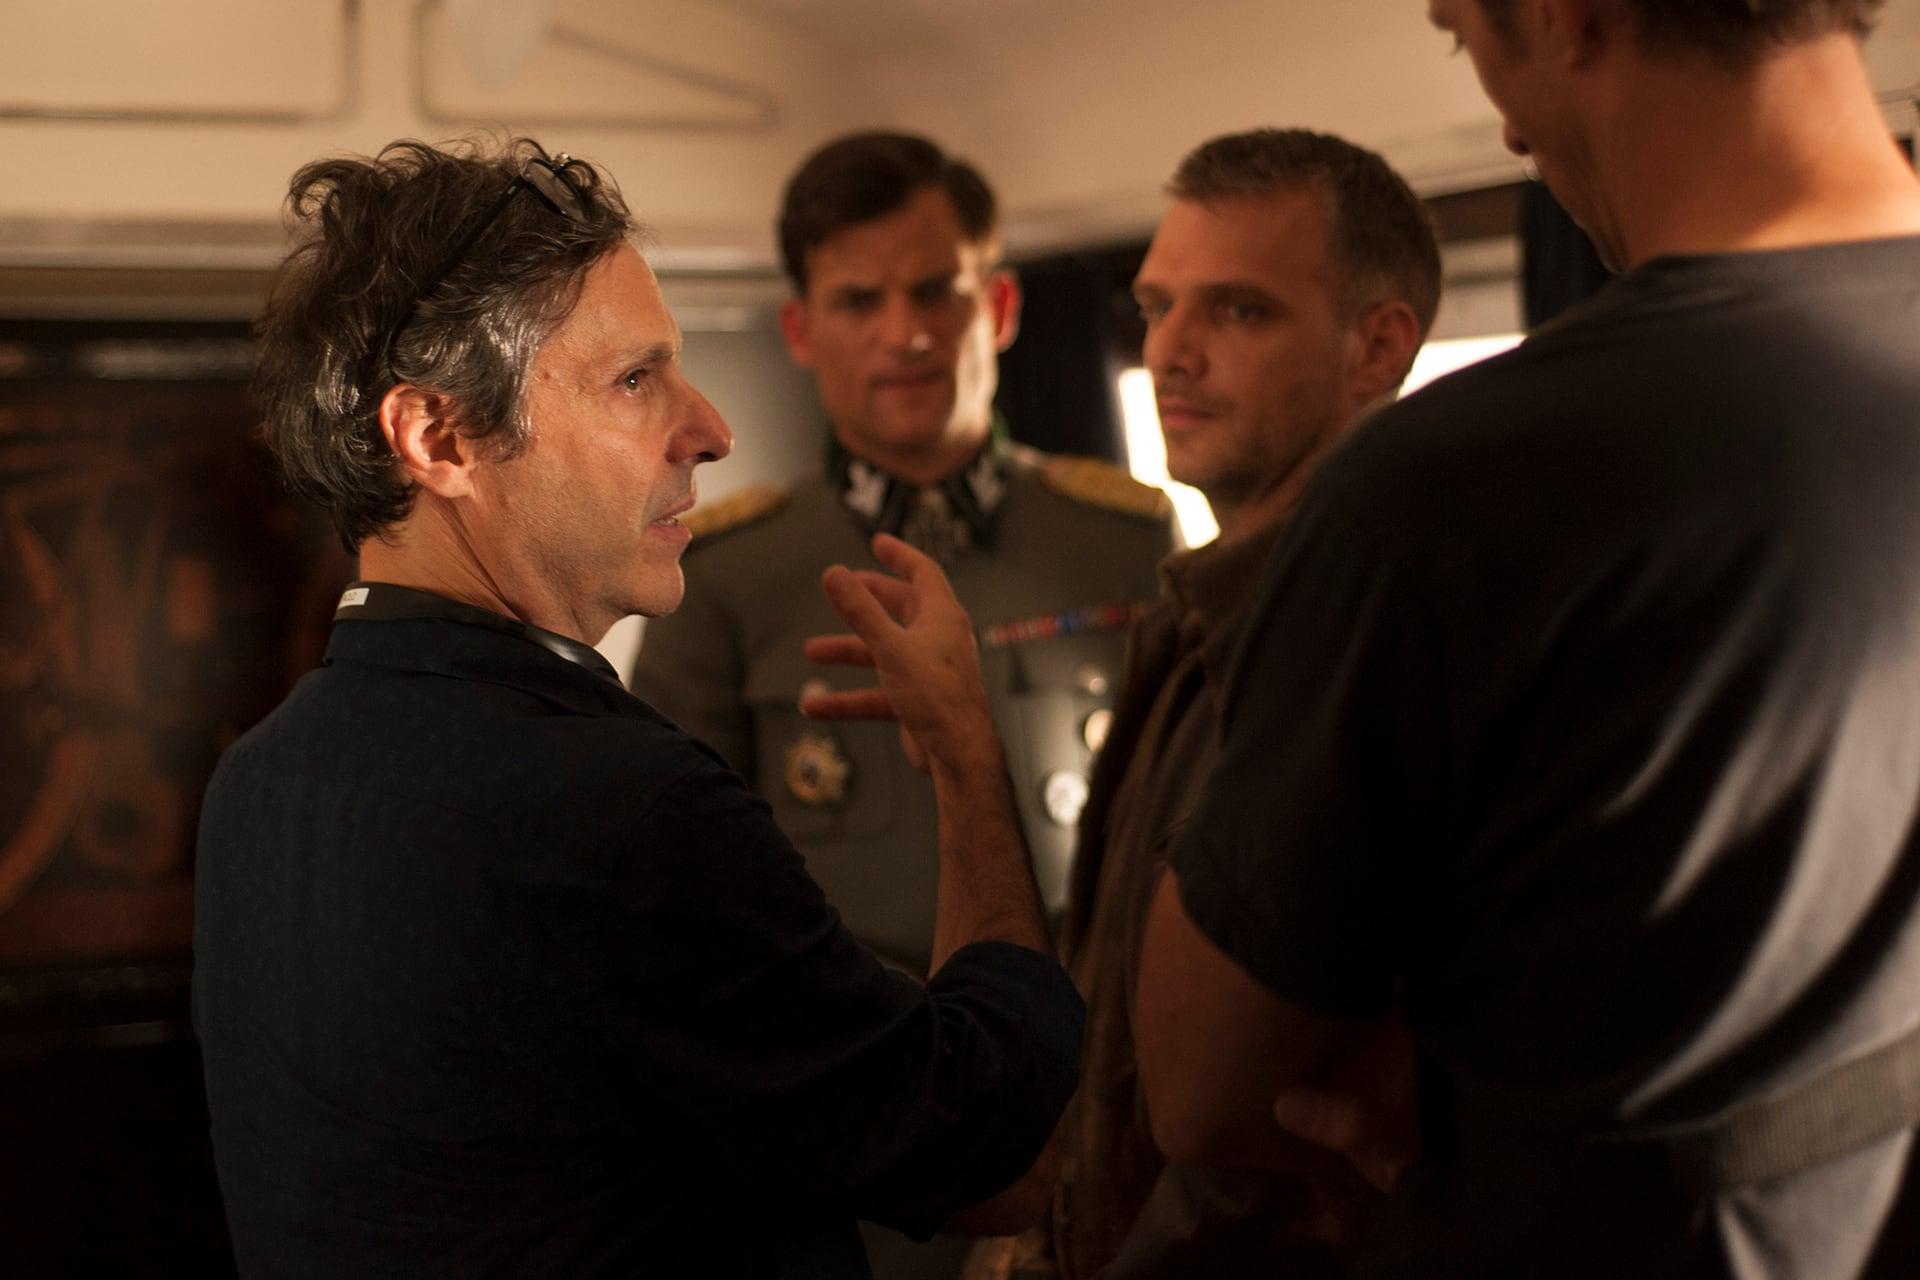 Director Paolo Barzman on the set of X Company Season 3.